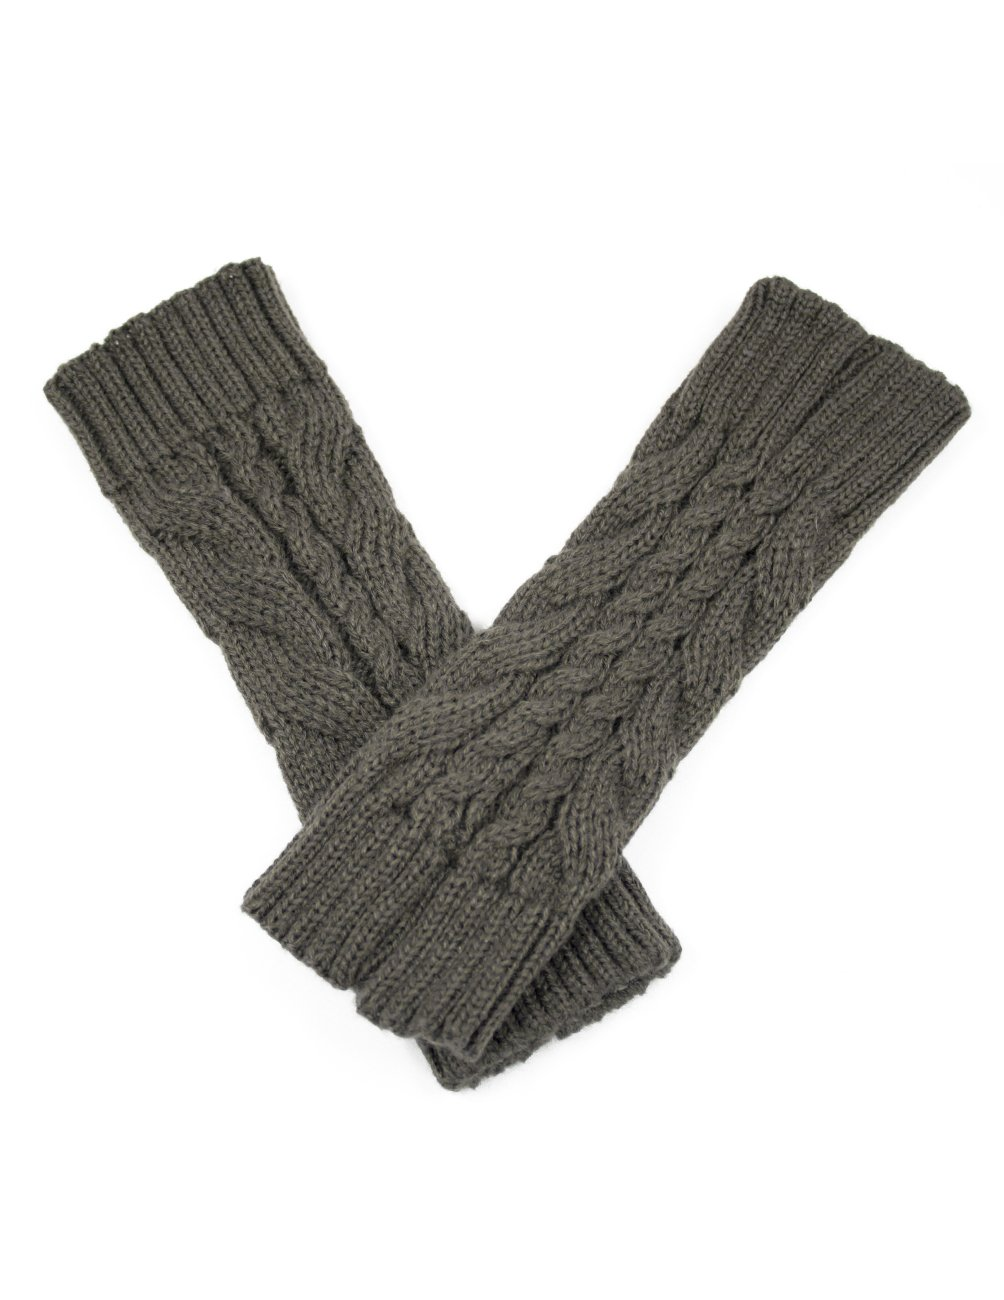 Dahlia Women's Cable Fingerless Arm Warmers Gloves - Short - Gray